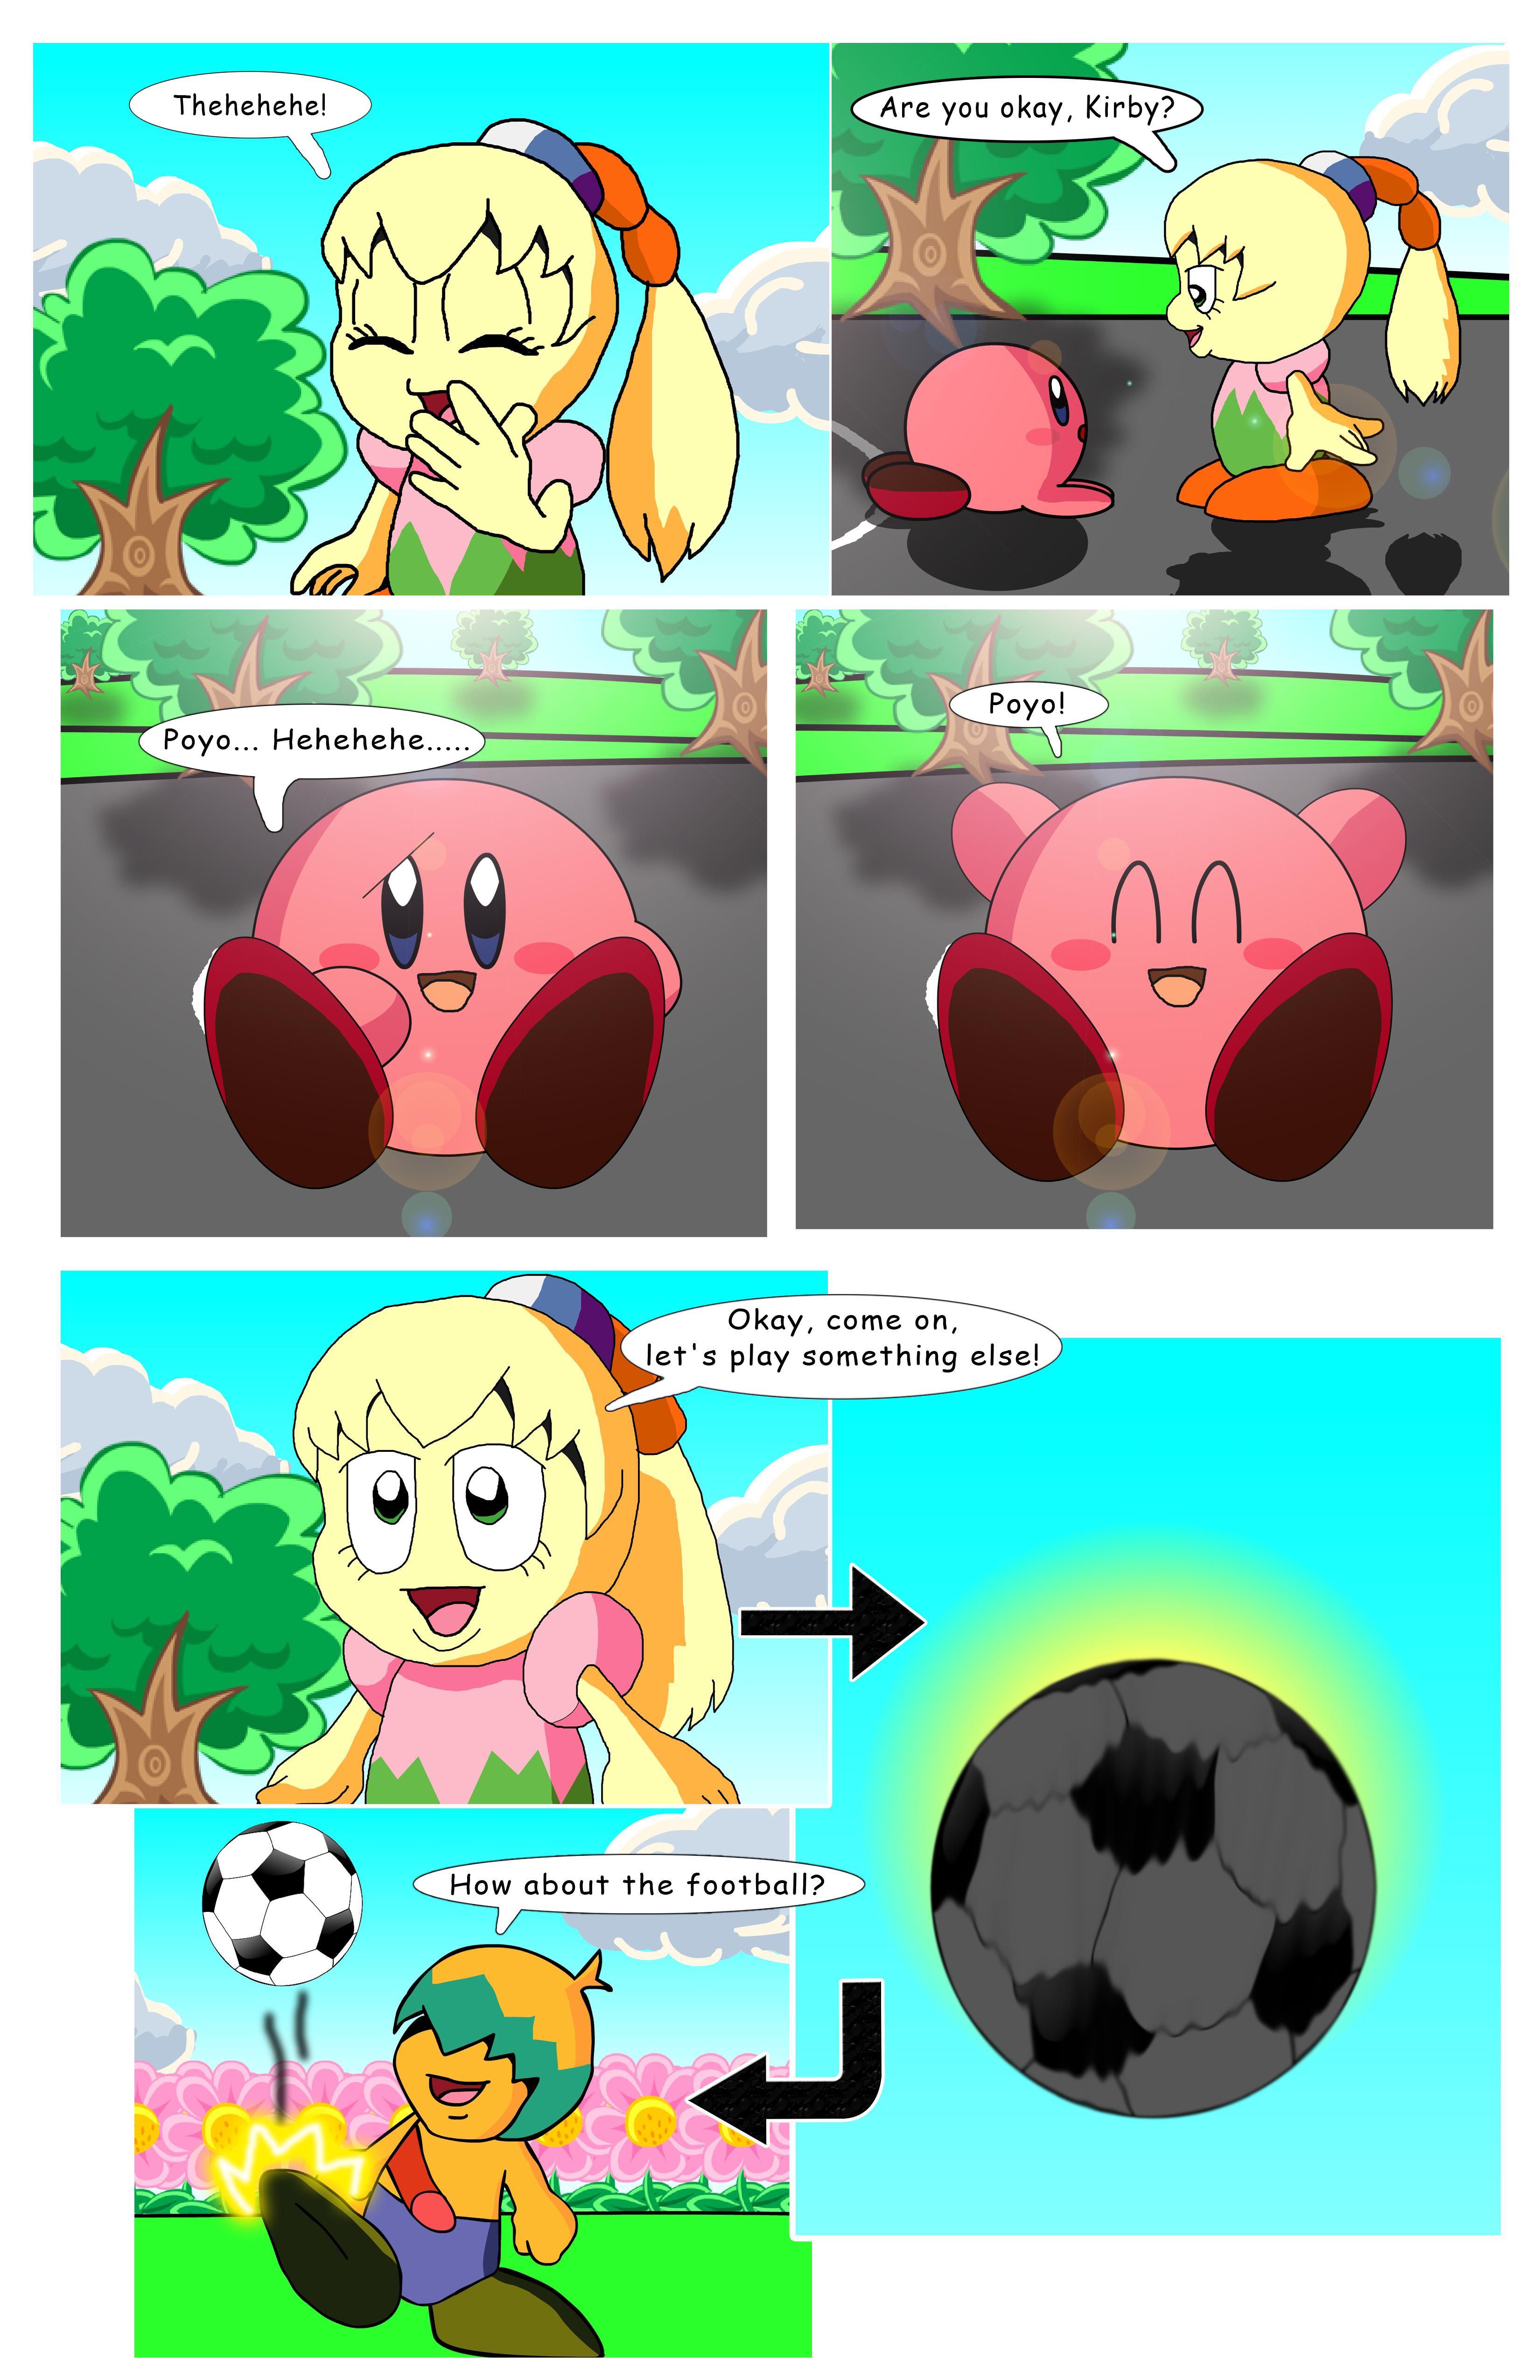 Kirby - WoA Page 9 by KingAsylus91